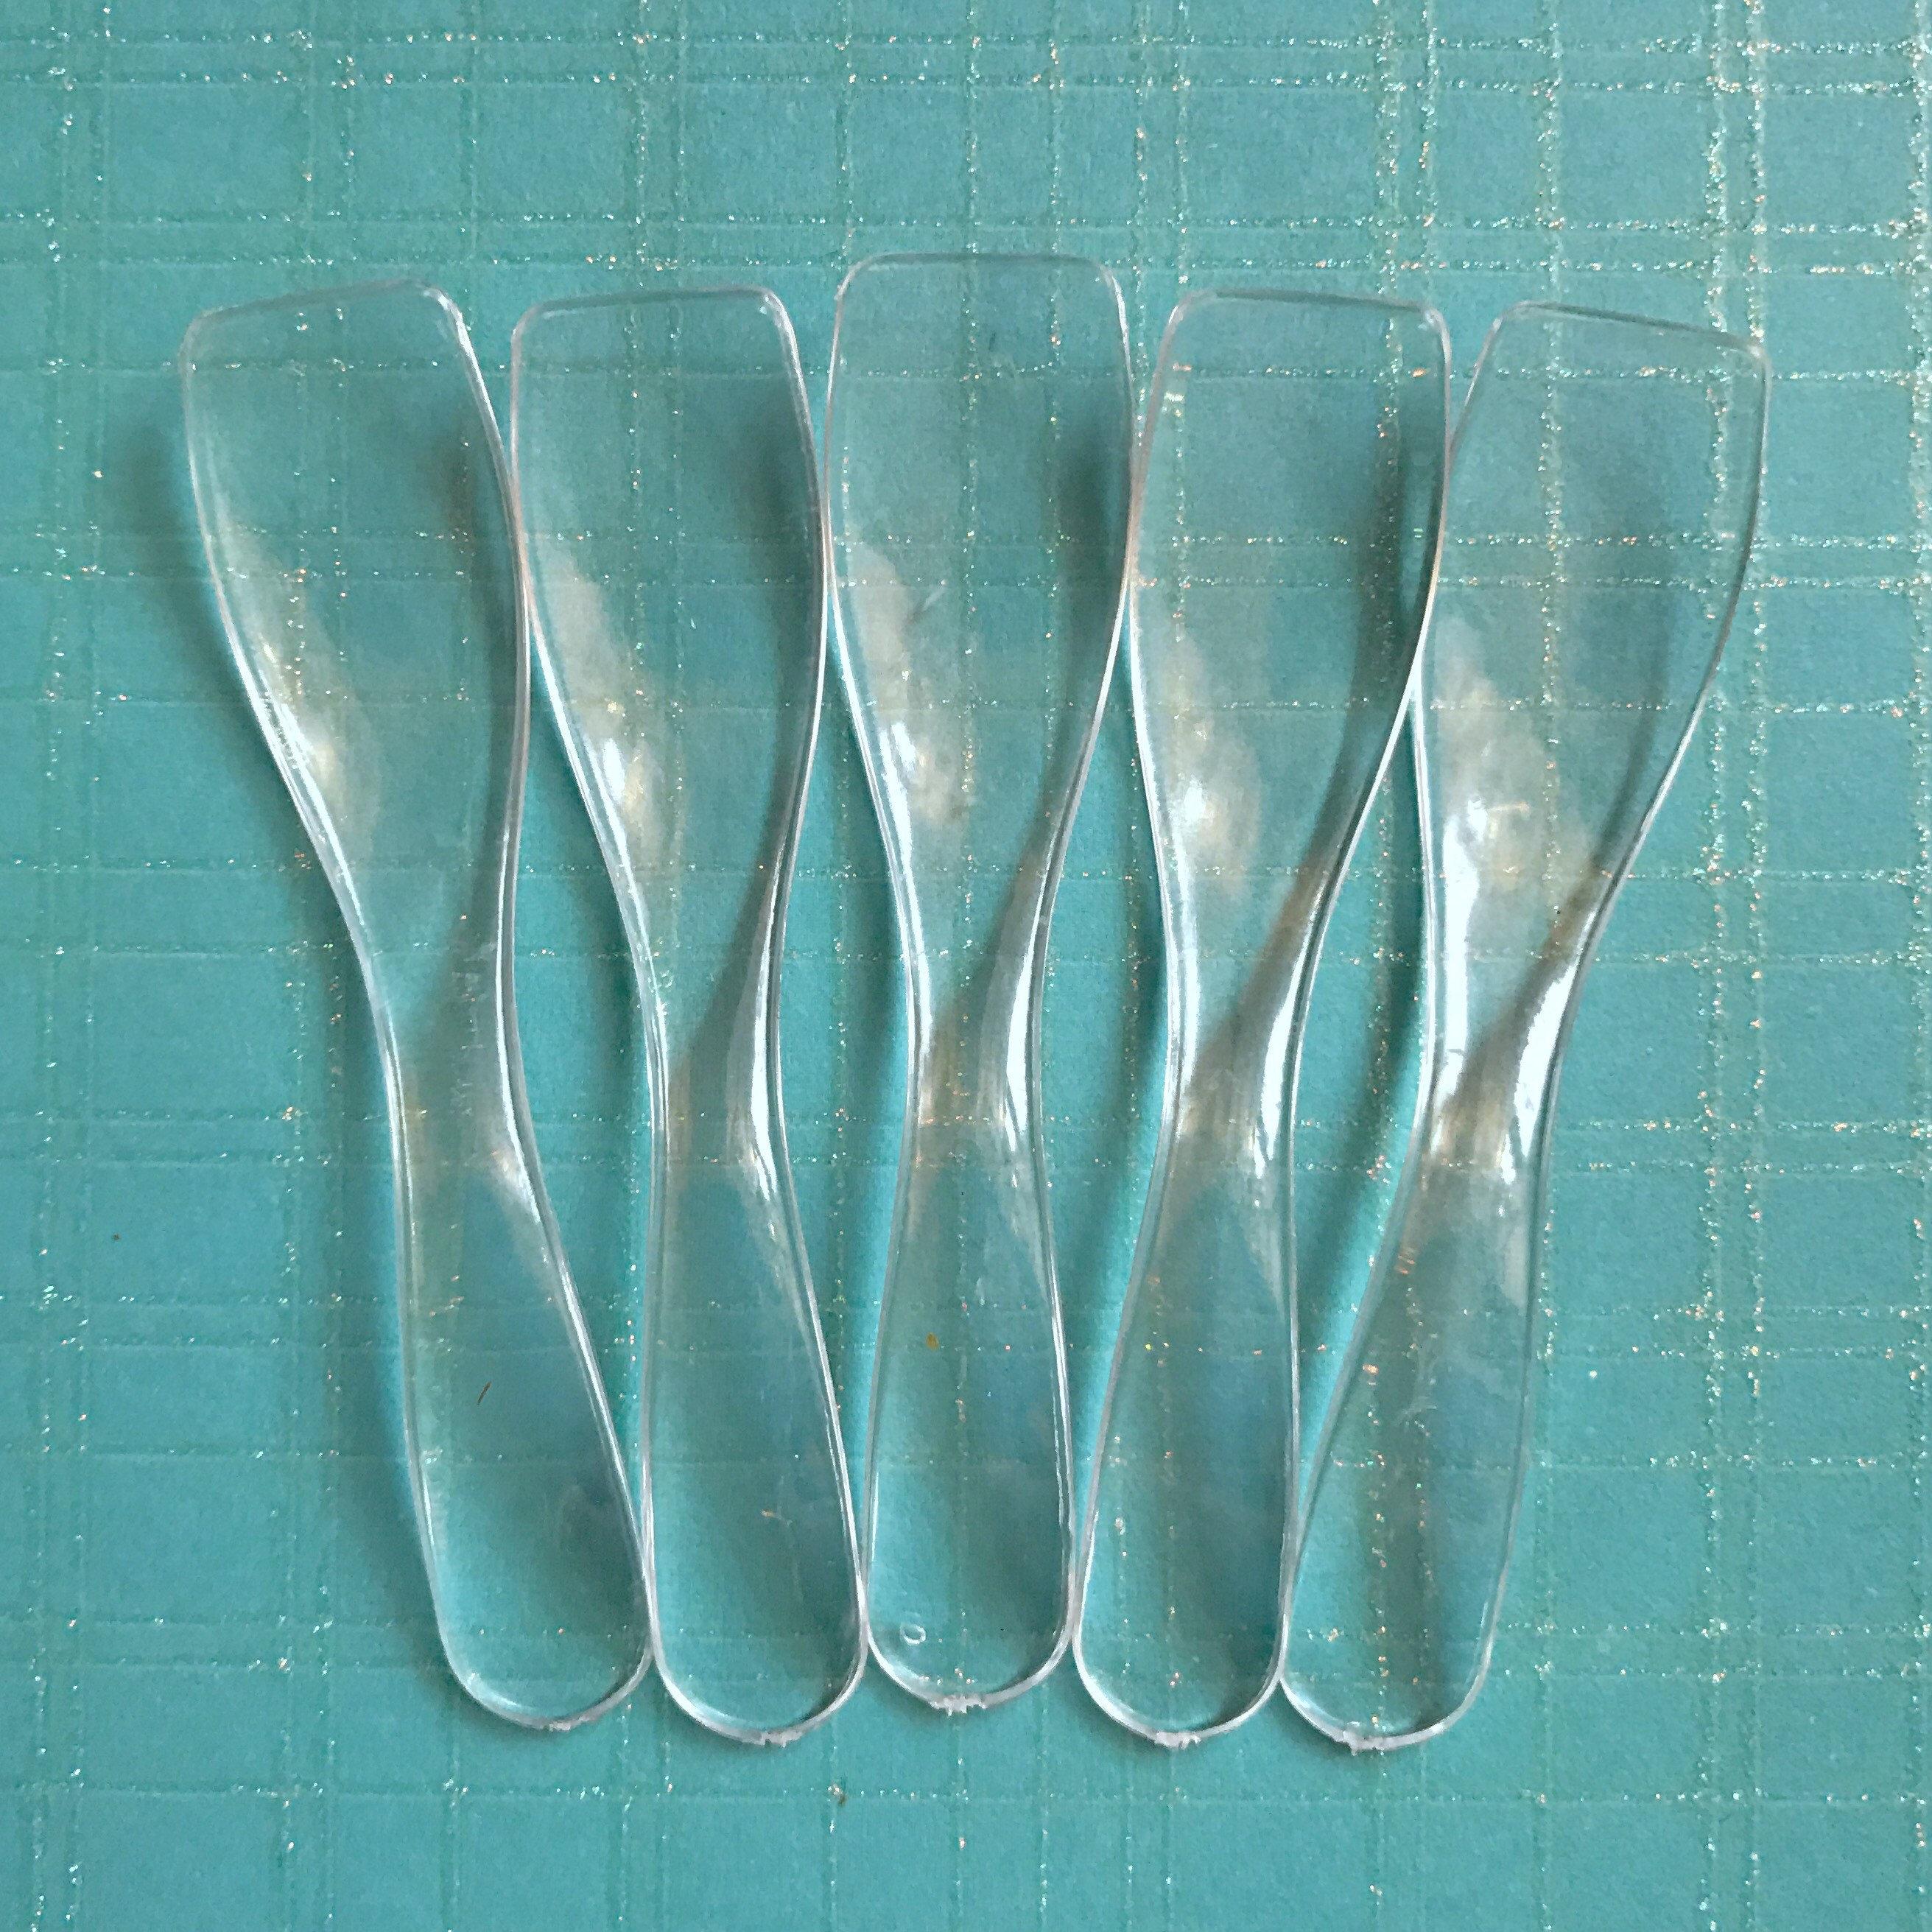 50- Curvy Clear Cosmetic Spoons, For Sugar Scrub, Body Butter ...